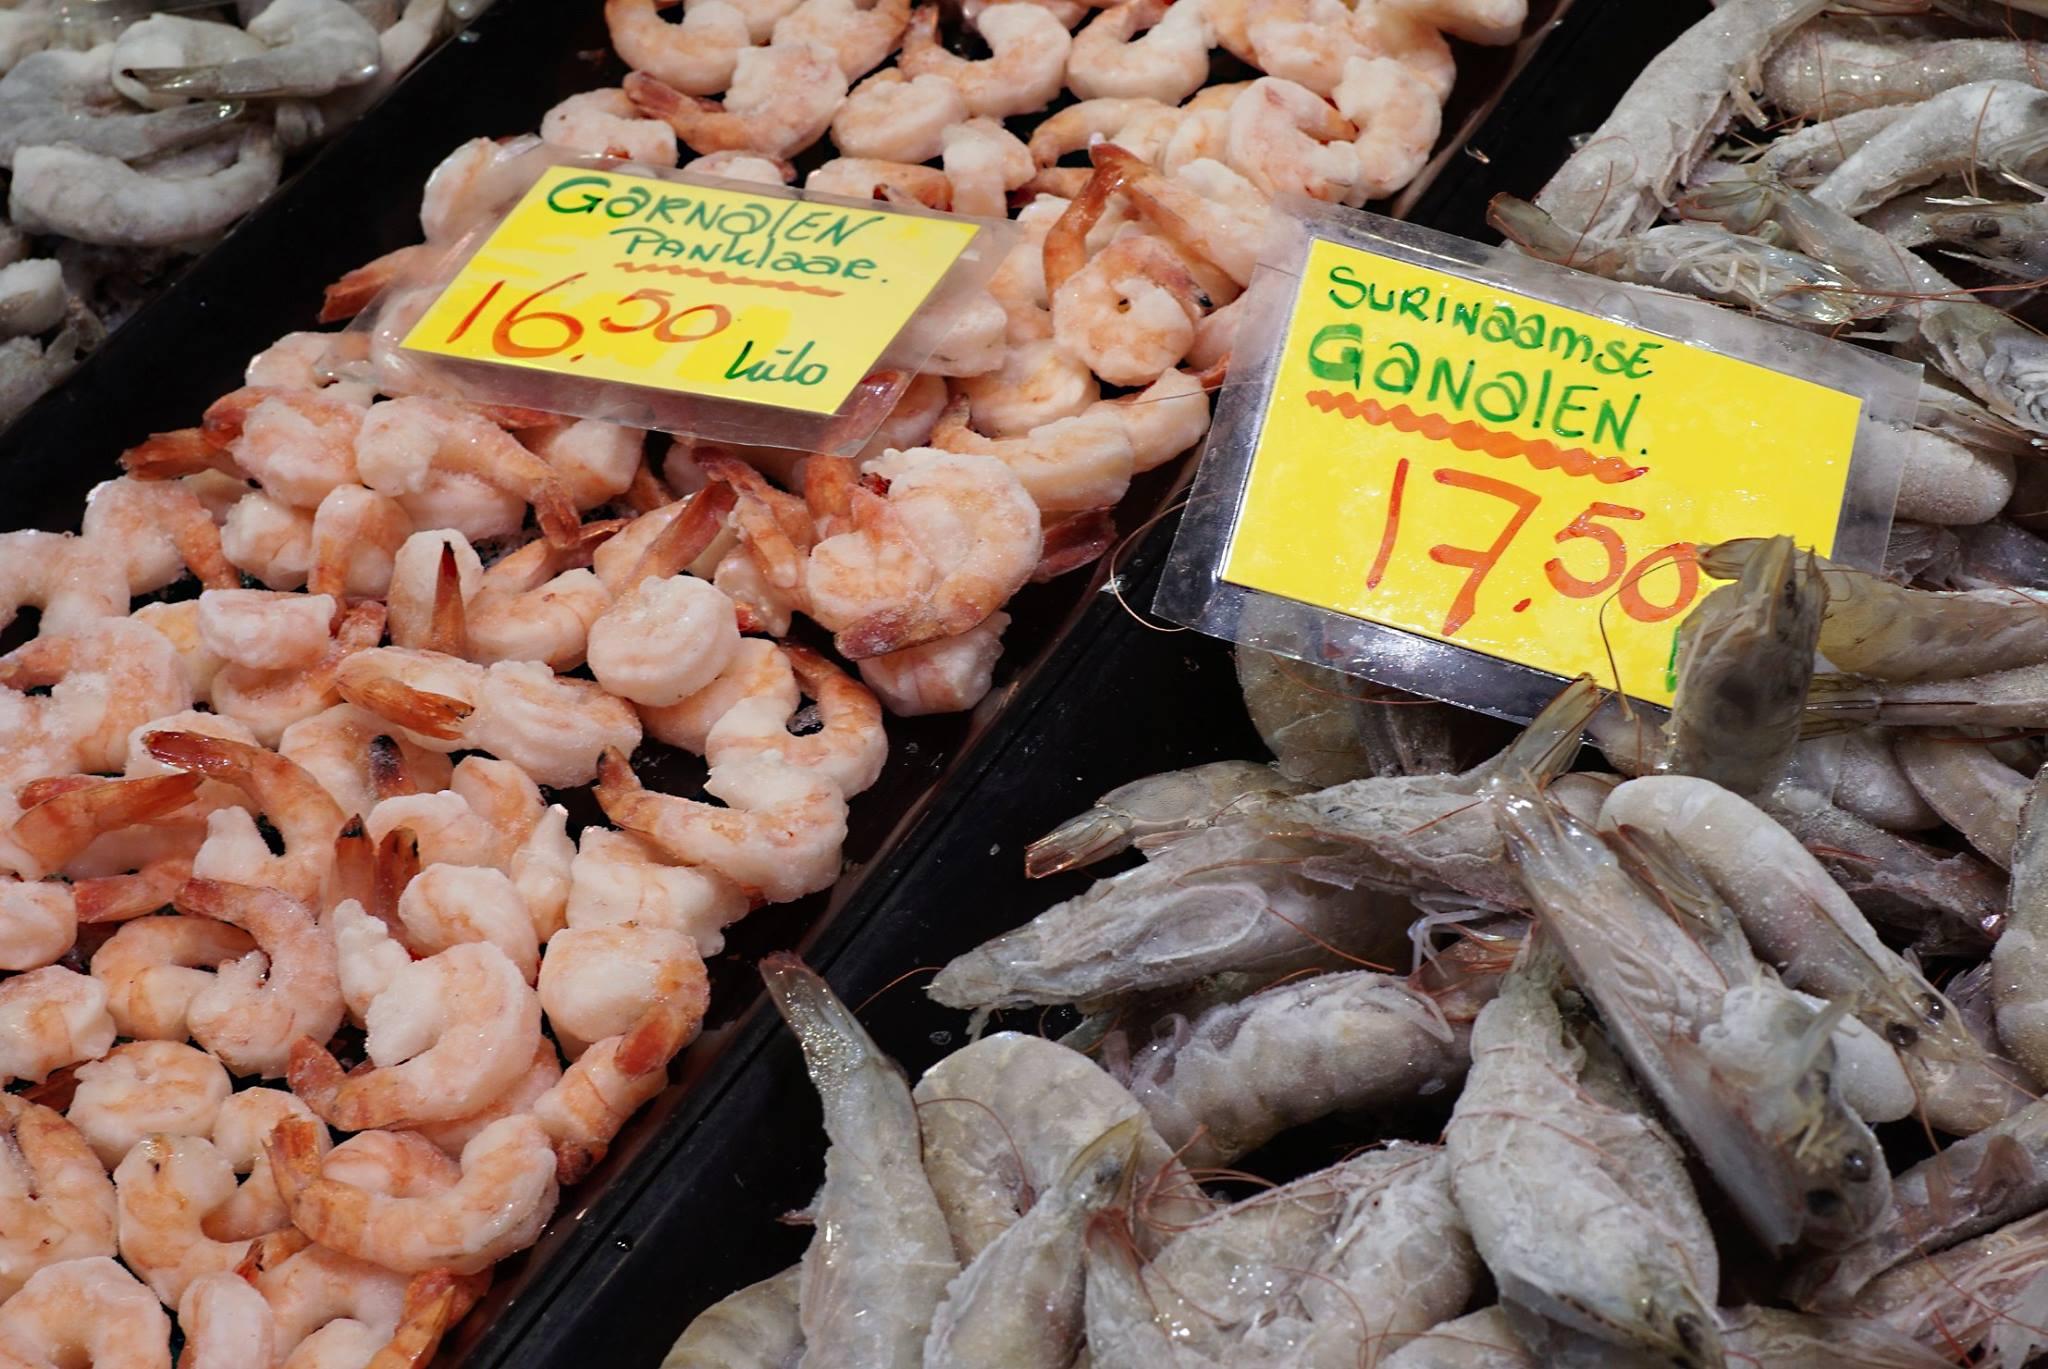 Vishandel Brouwer 5